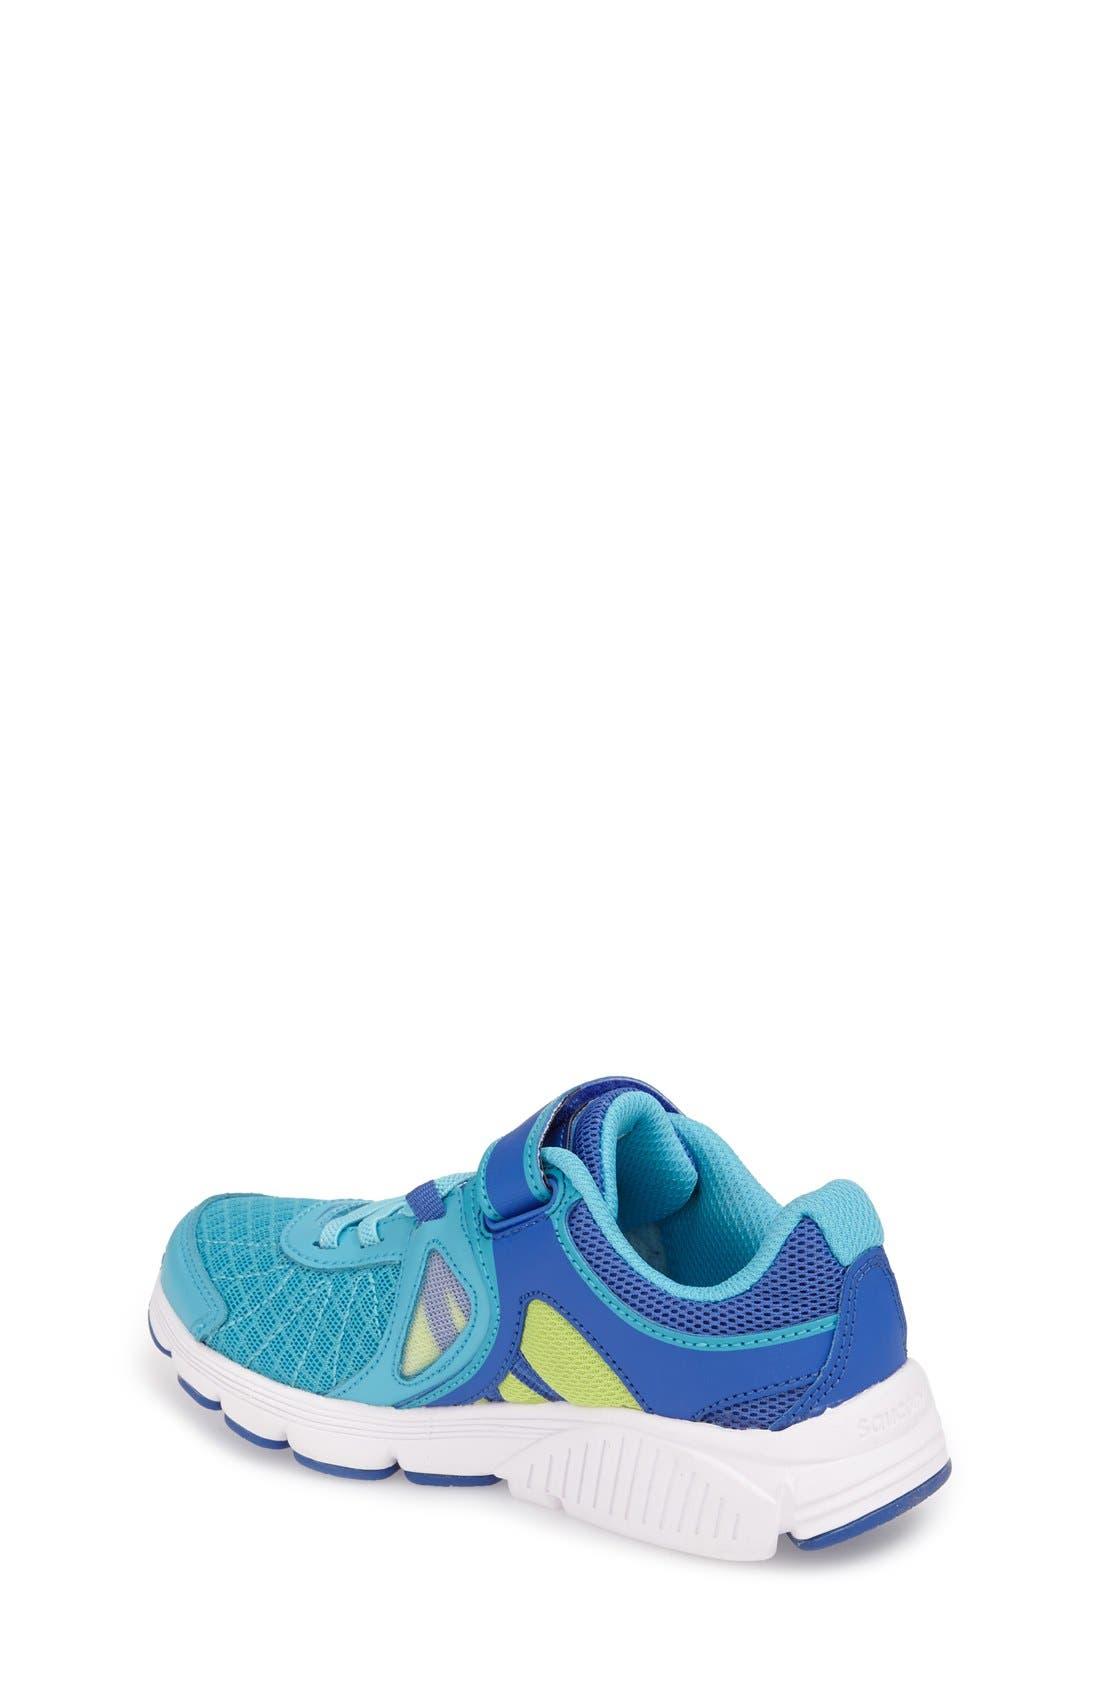 'Kotaro 3 AC' Athletic Sneaker,                             Alternate thumbnail 8, color,